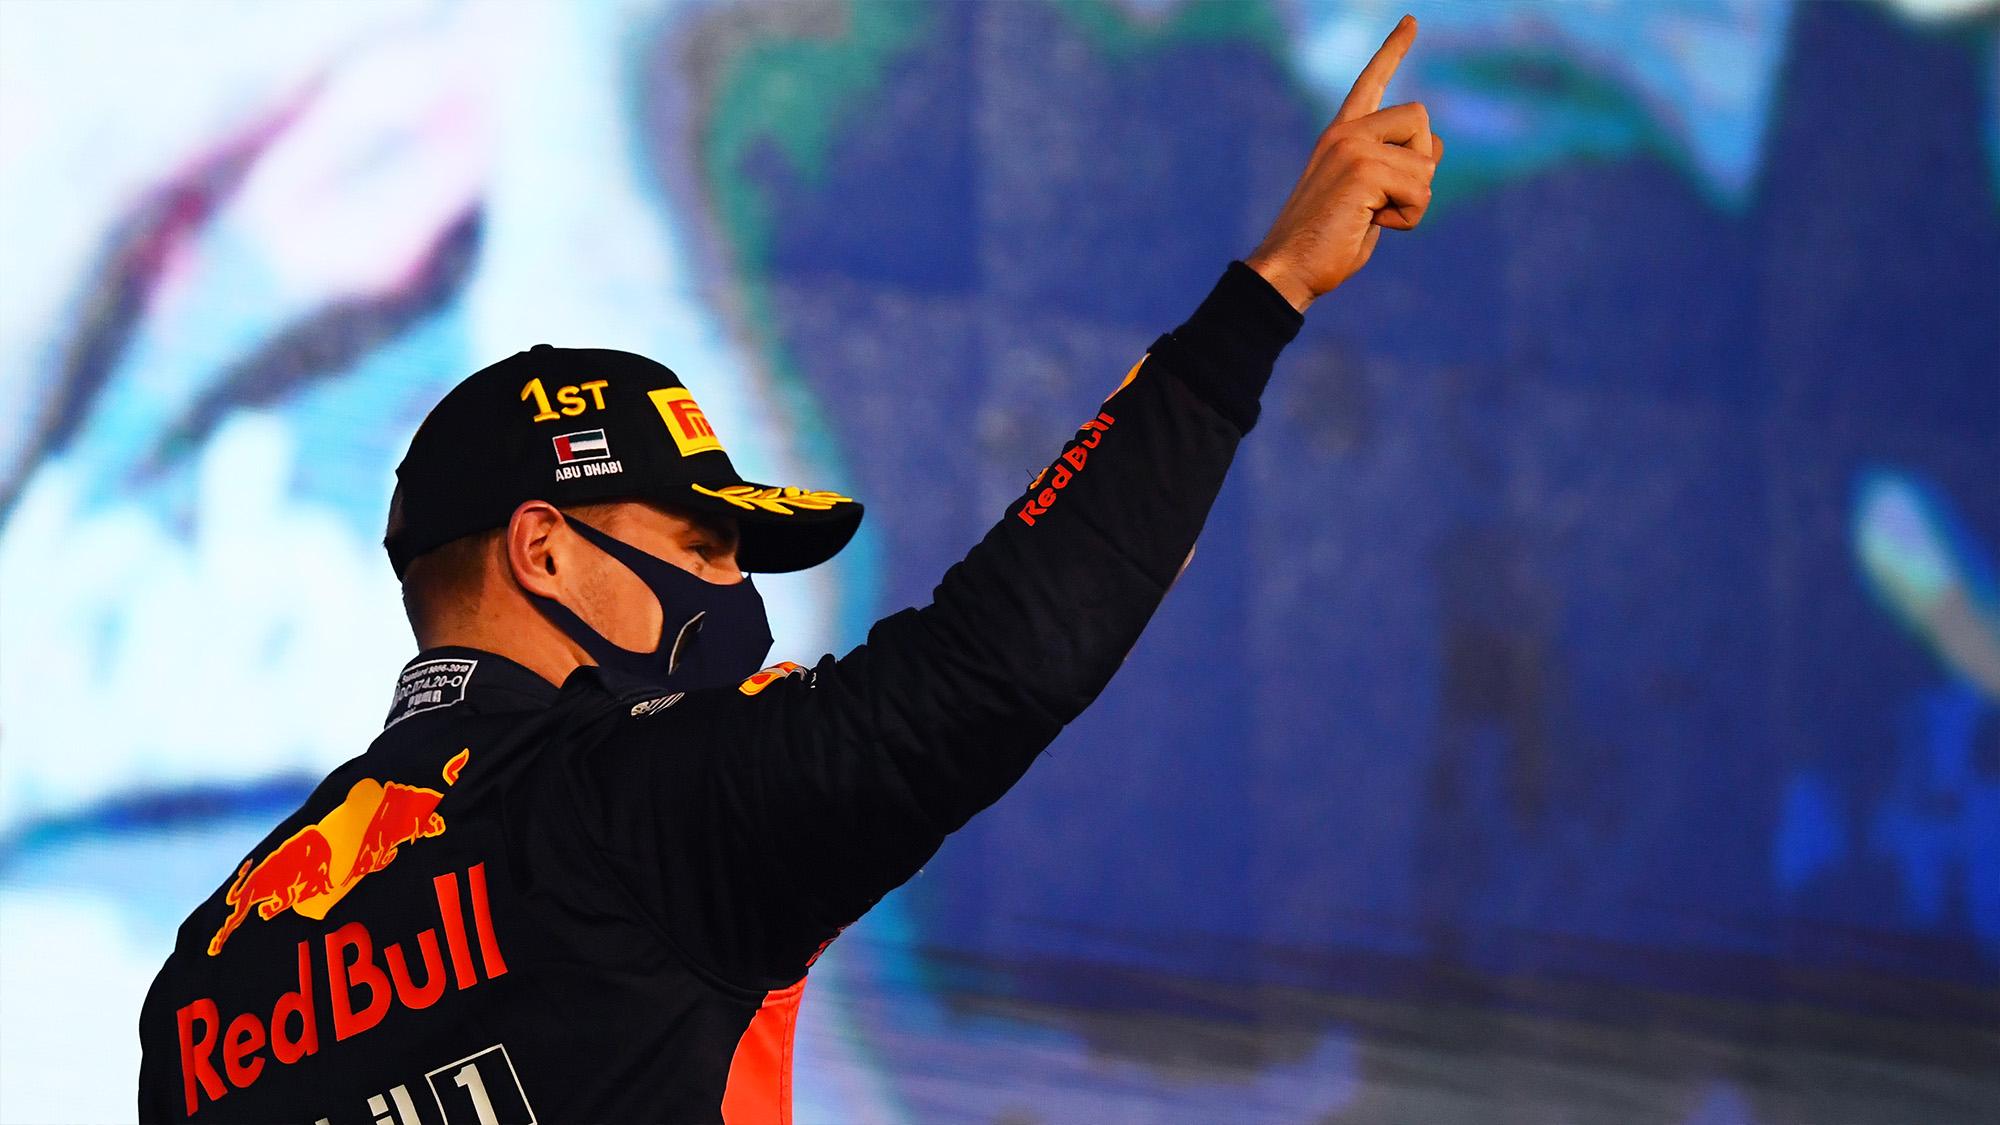 Max Verstappen salutes as the winner of the 2020 Abu Dhabi Grand Prix